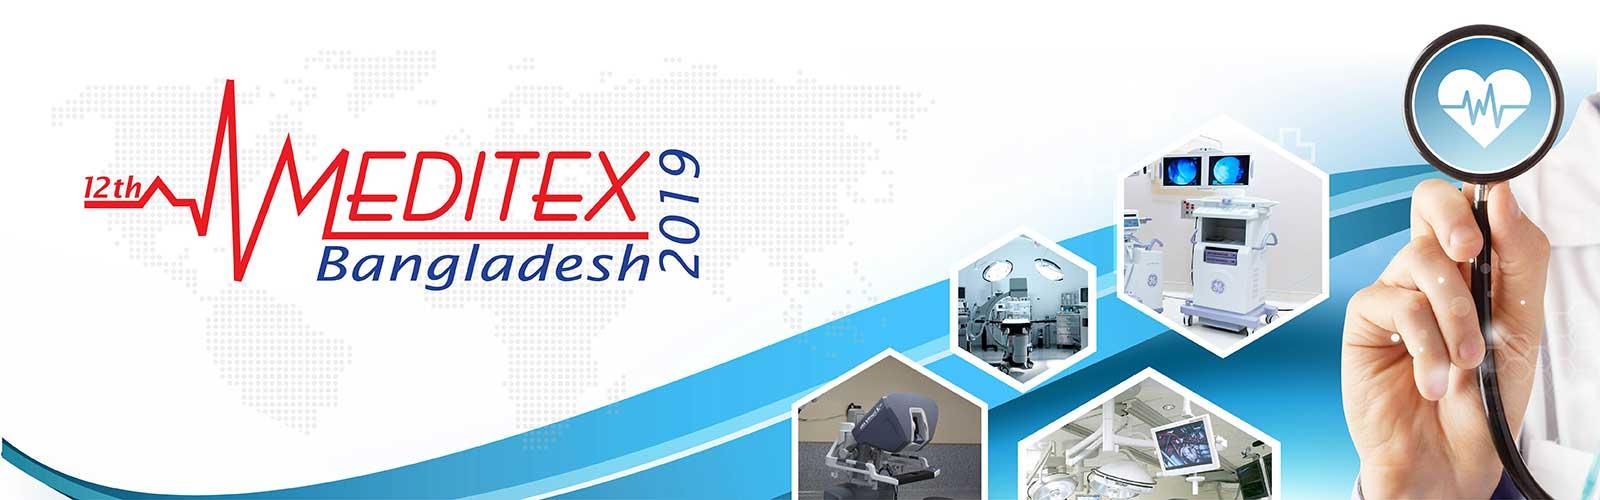 12th Meditex Bangladesh 2019